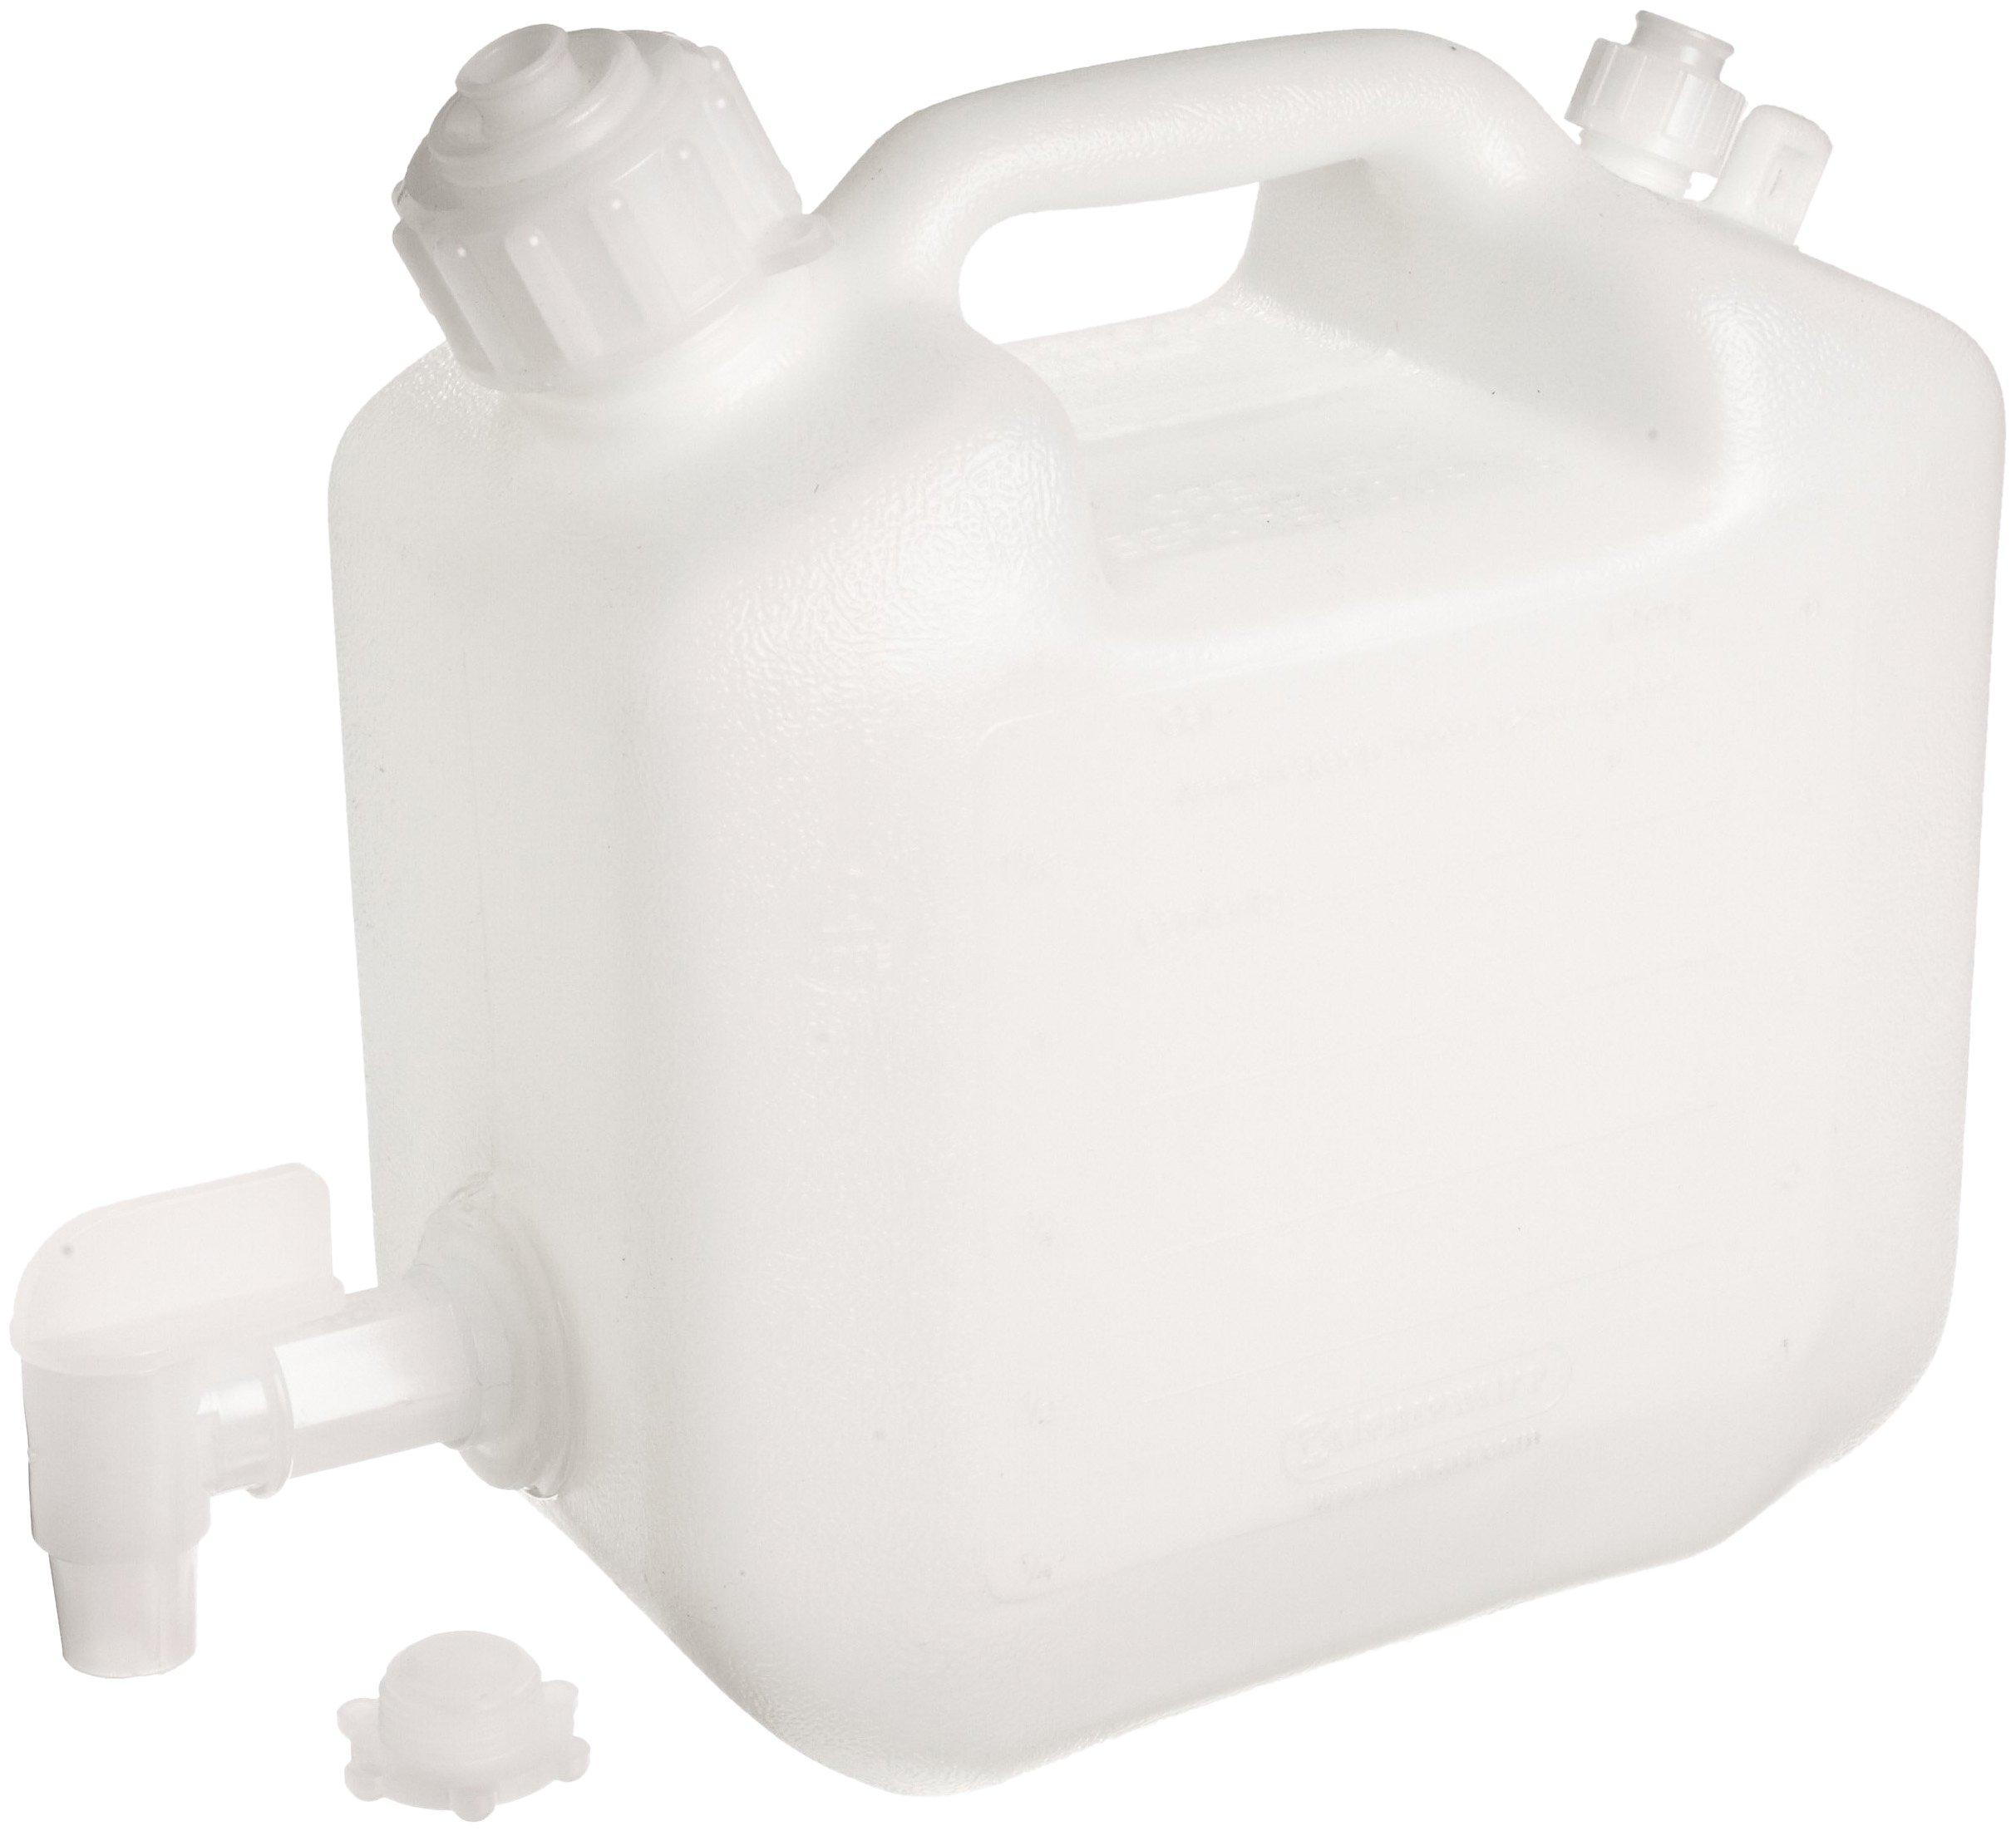 Bel-Art Polyethylene Jerrican with Spigot; 5 Liters (1.25 Gallons), Screw Cap, 1 in. I.D. Spout (F11859-0010)